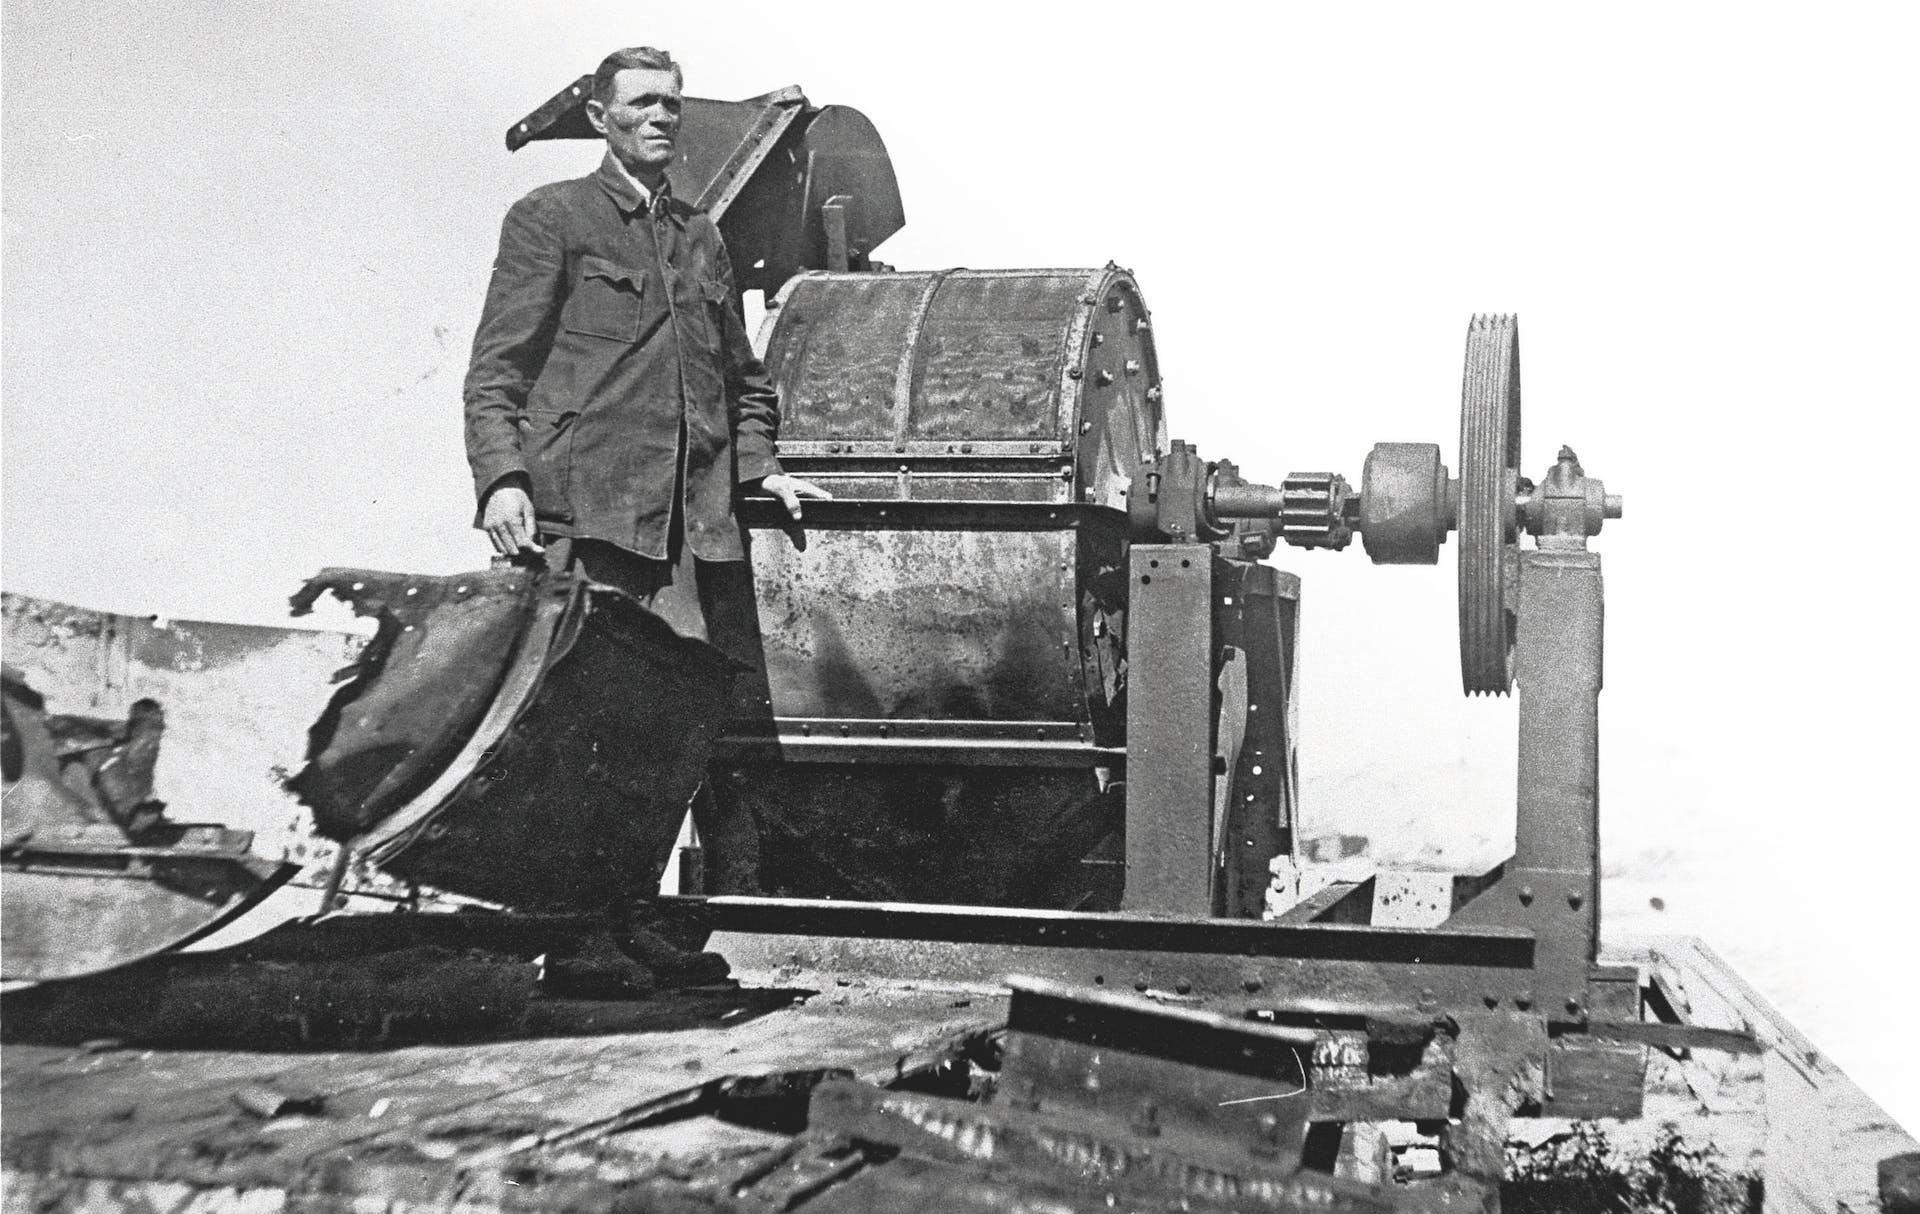 SS-kommandoens knogleknuser-maskine